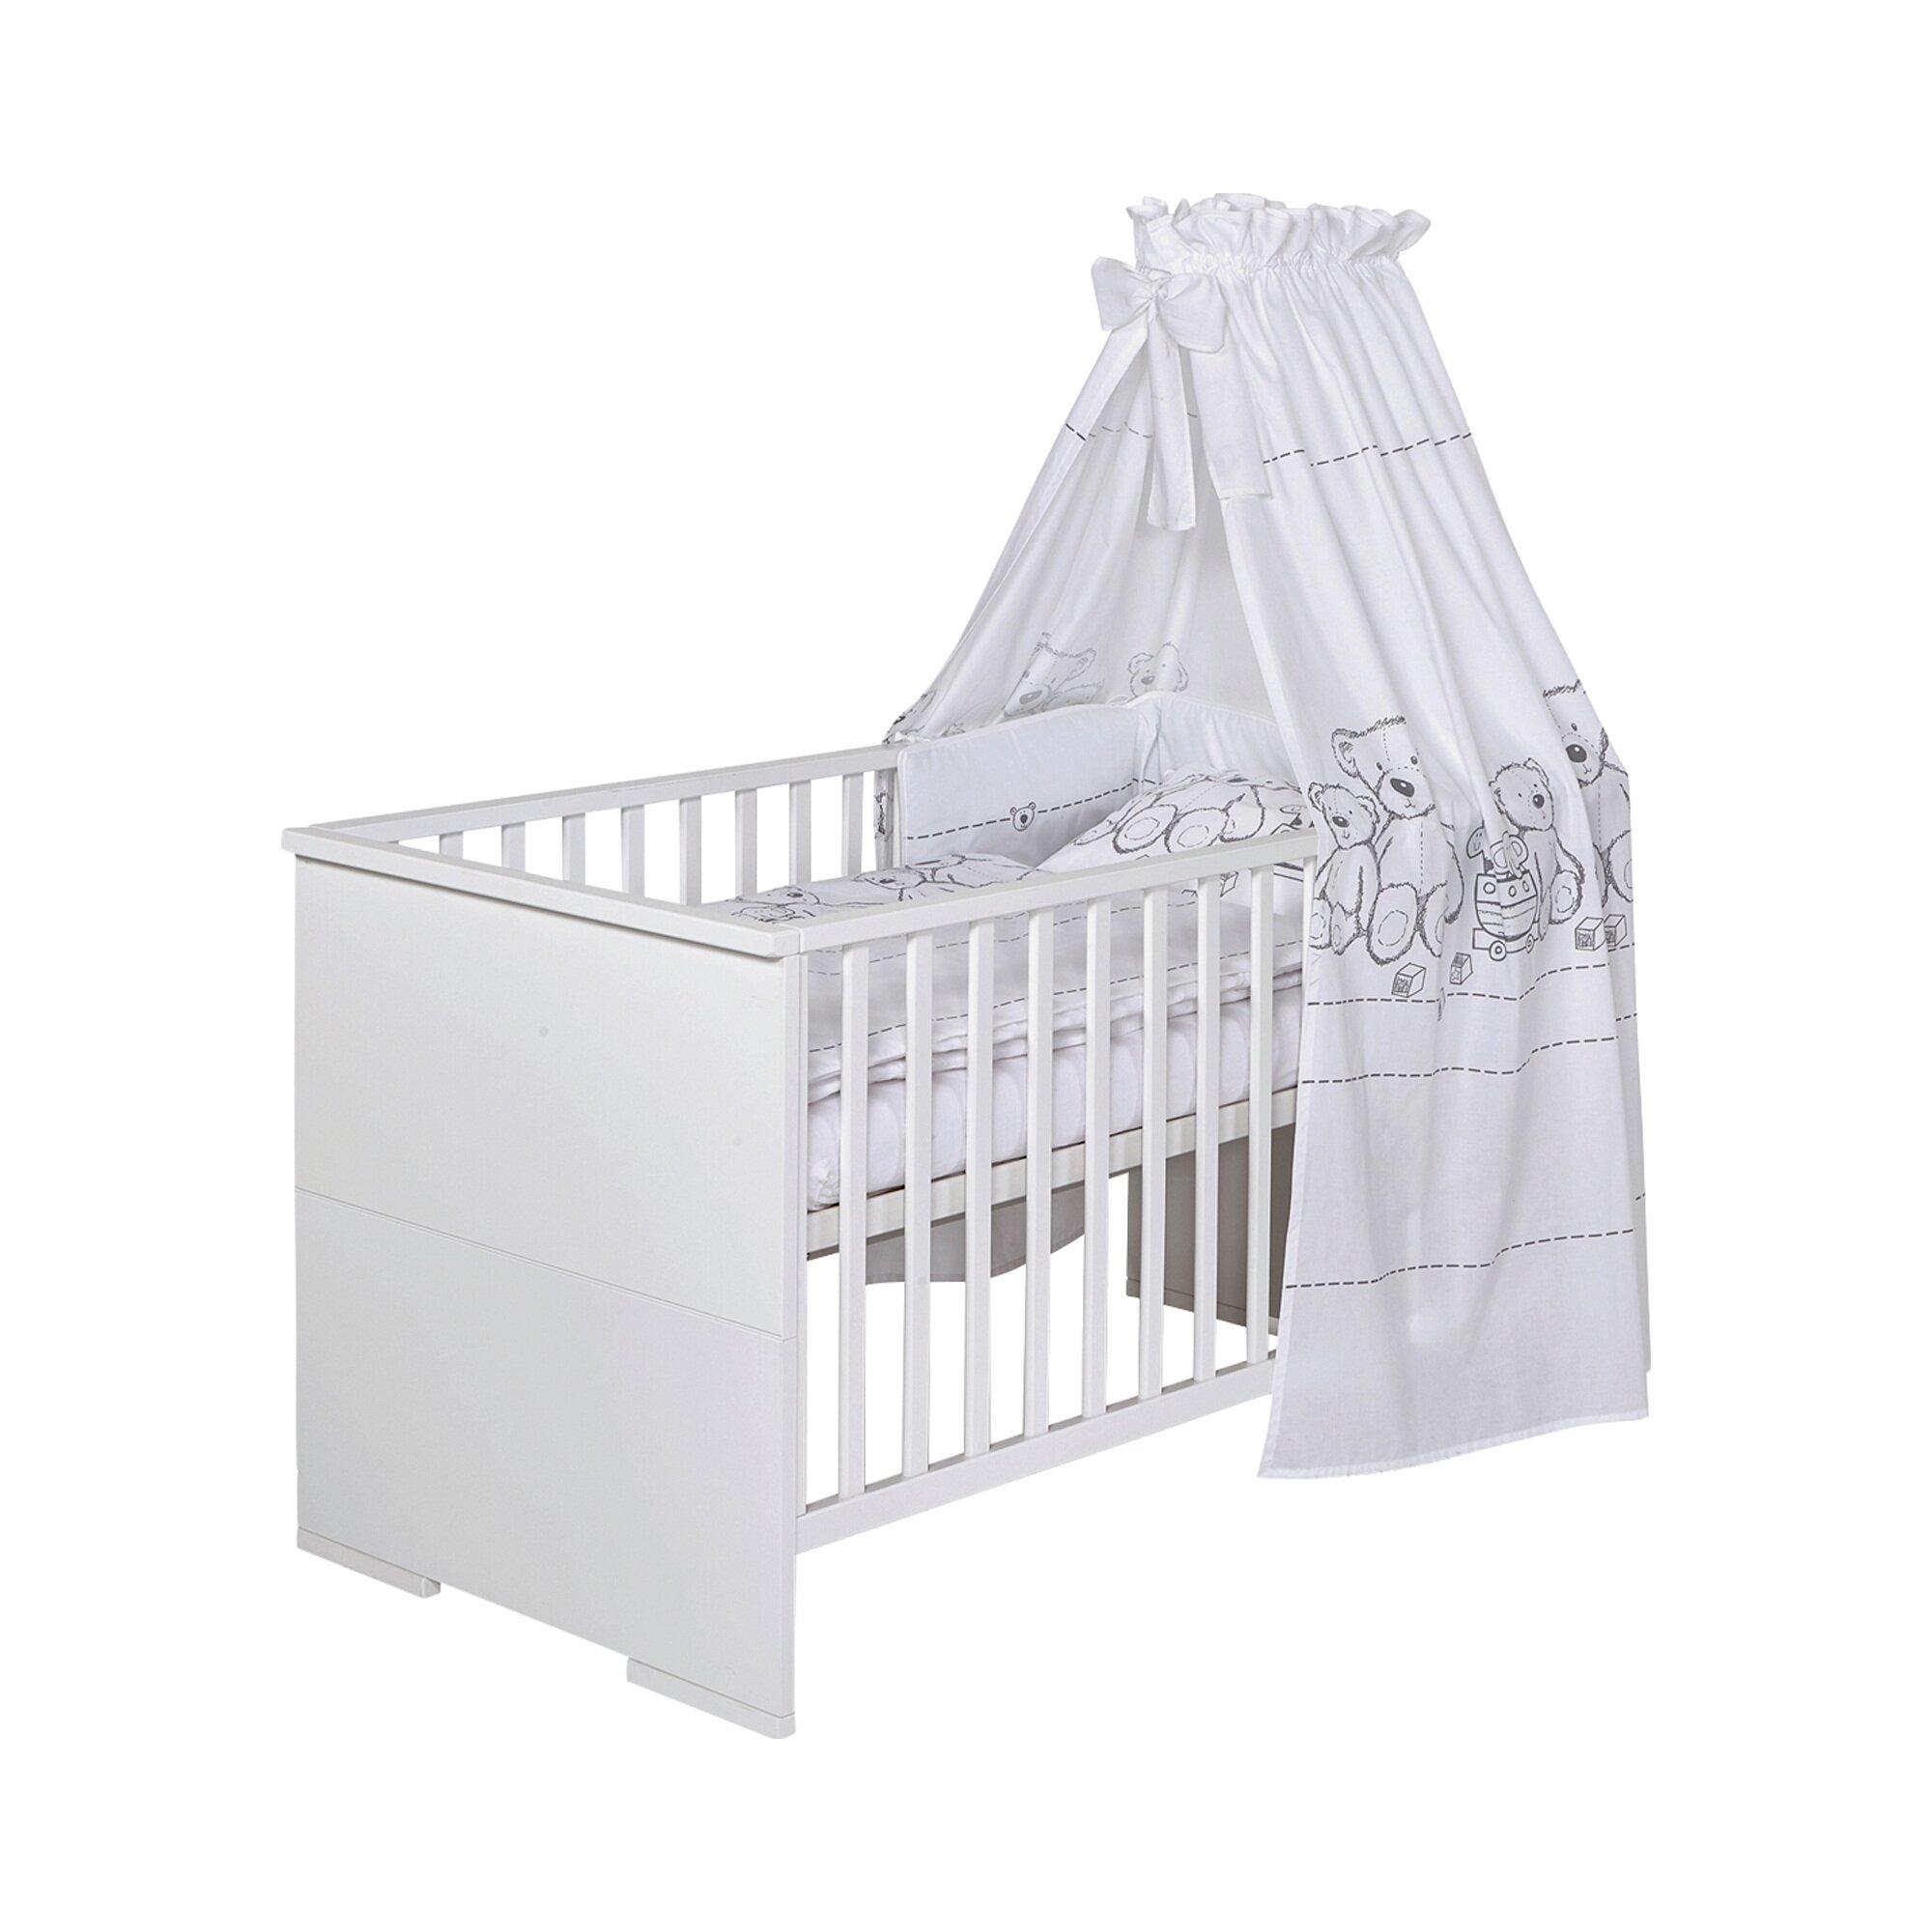 Schardt Babybett Maxx White 70x140